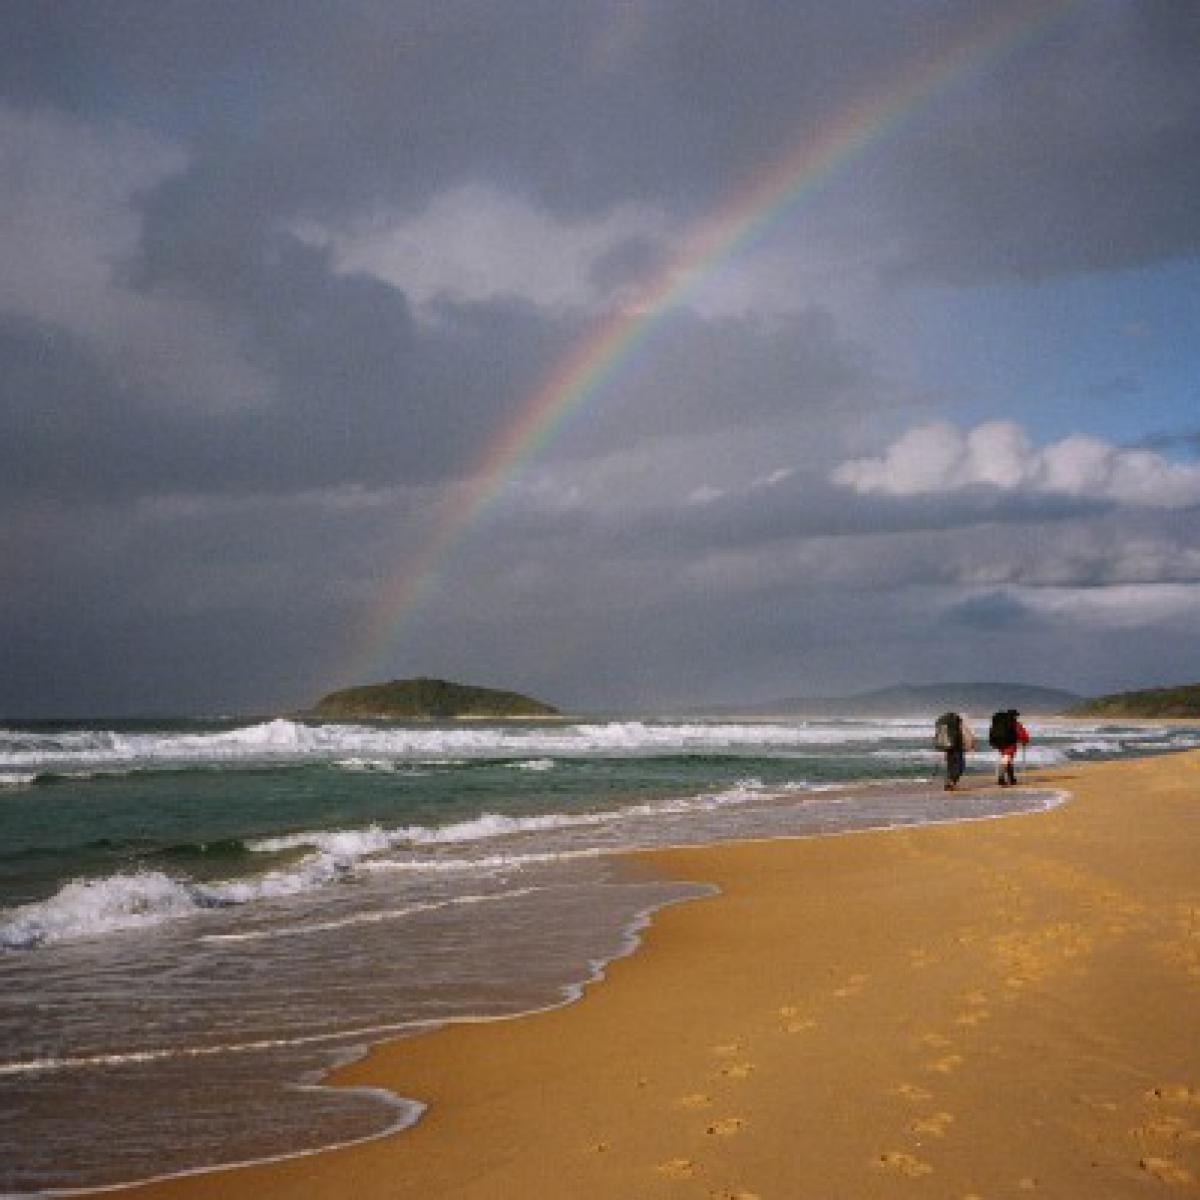 Wairo Beach, NSW South Coast